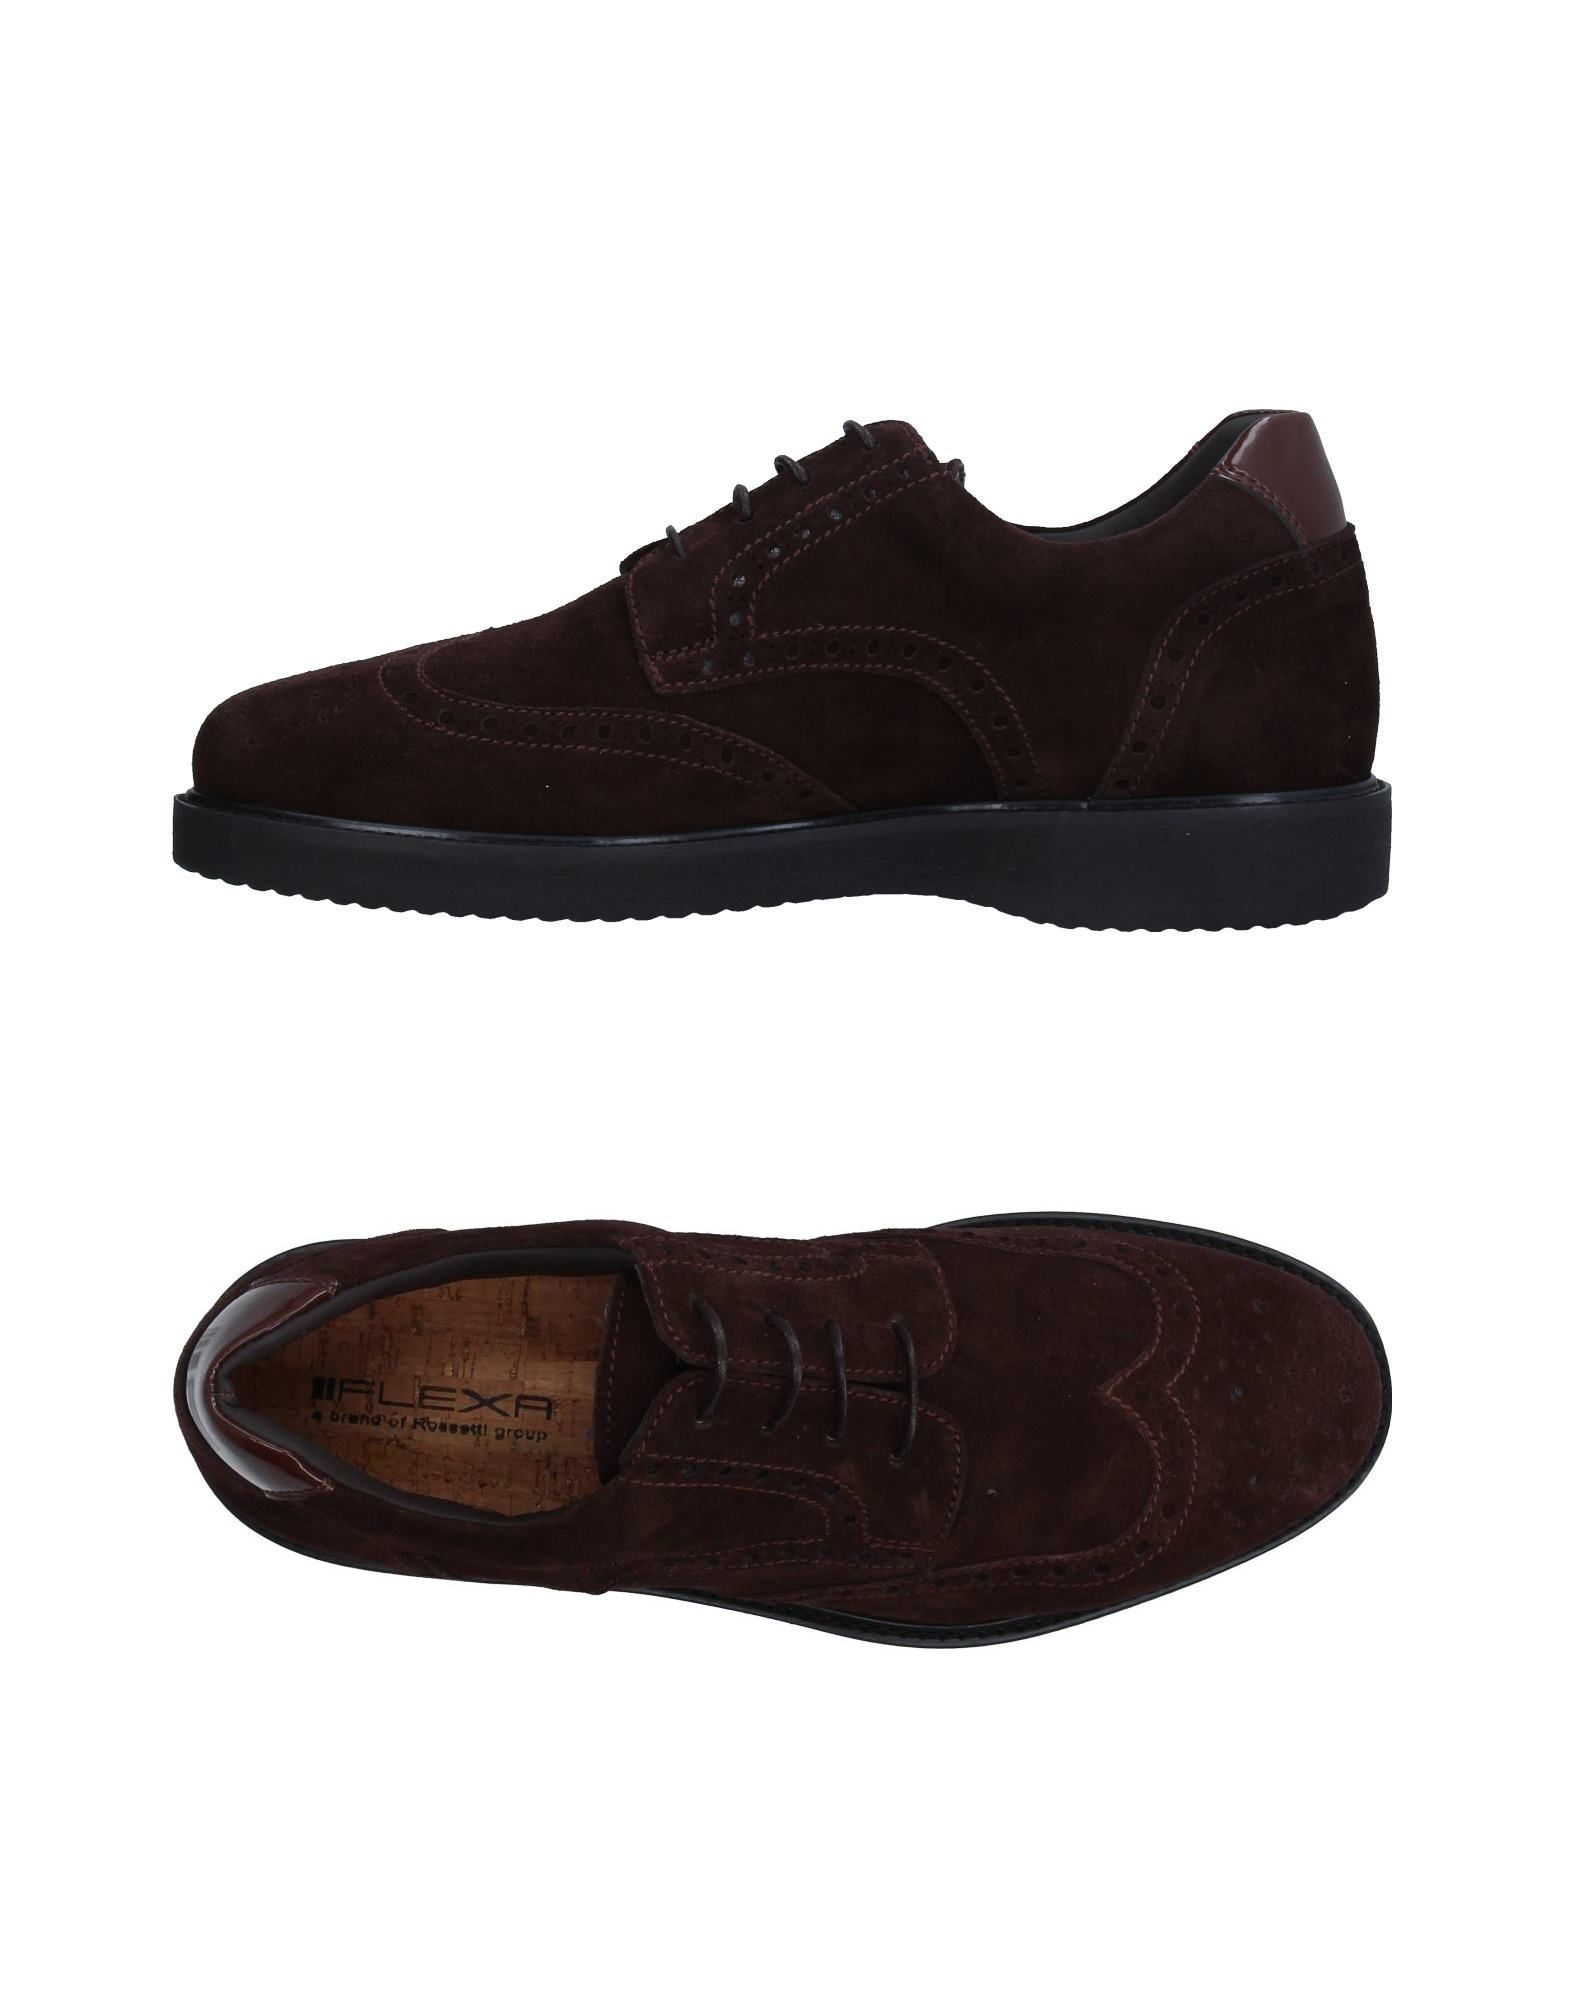 FLEXA by FRATELLI ROSSETTI Обувь на шнурках цены онлайн